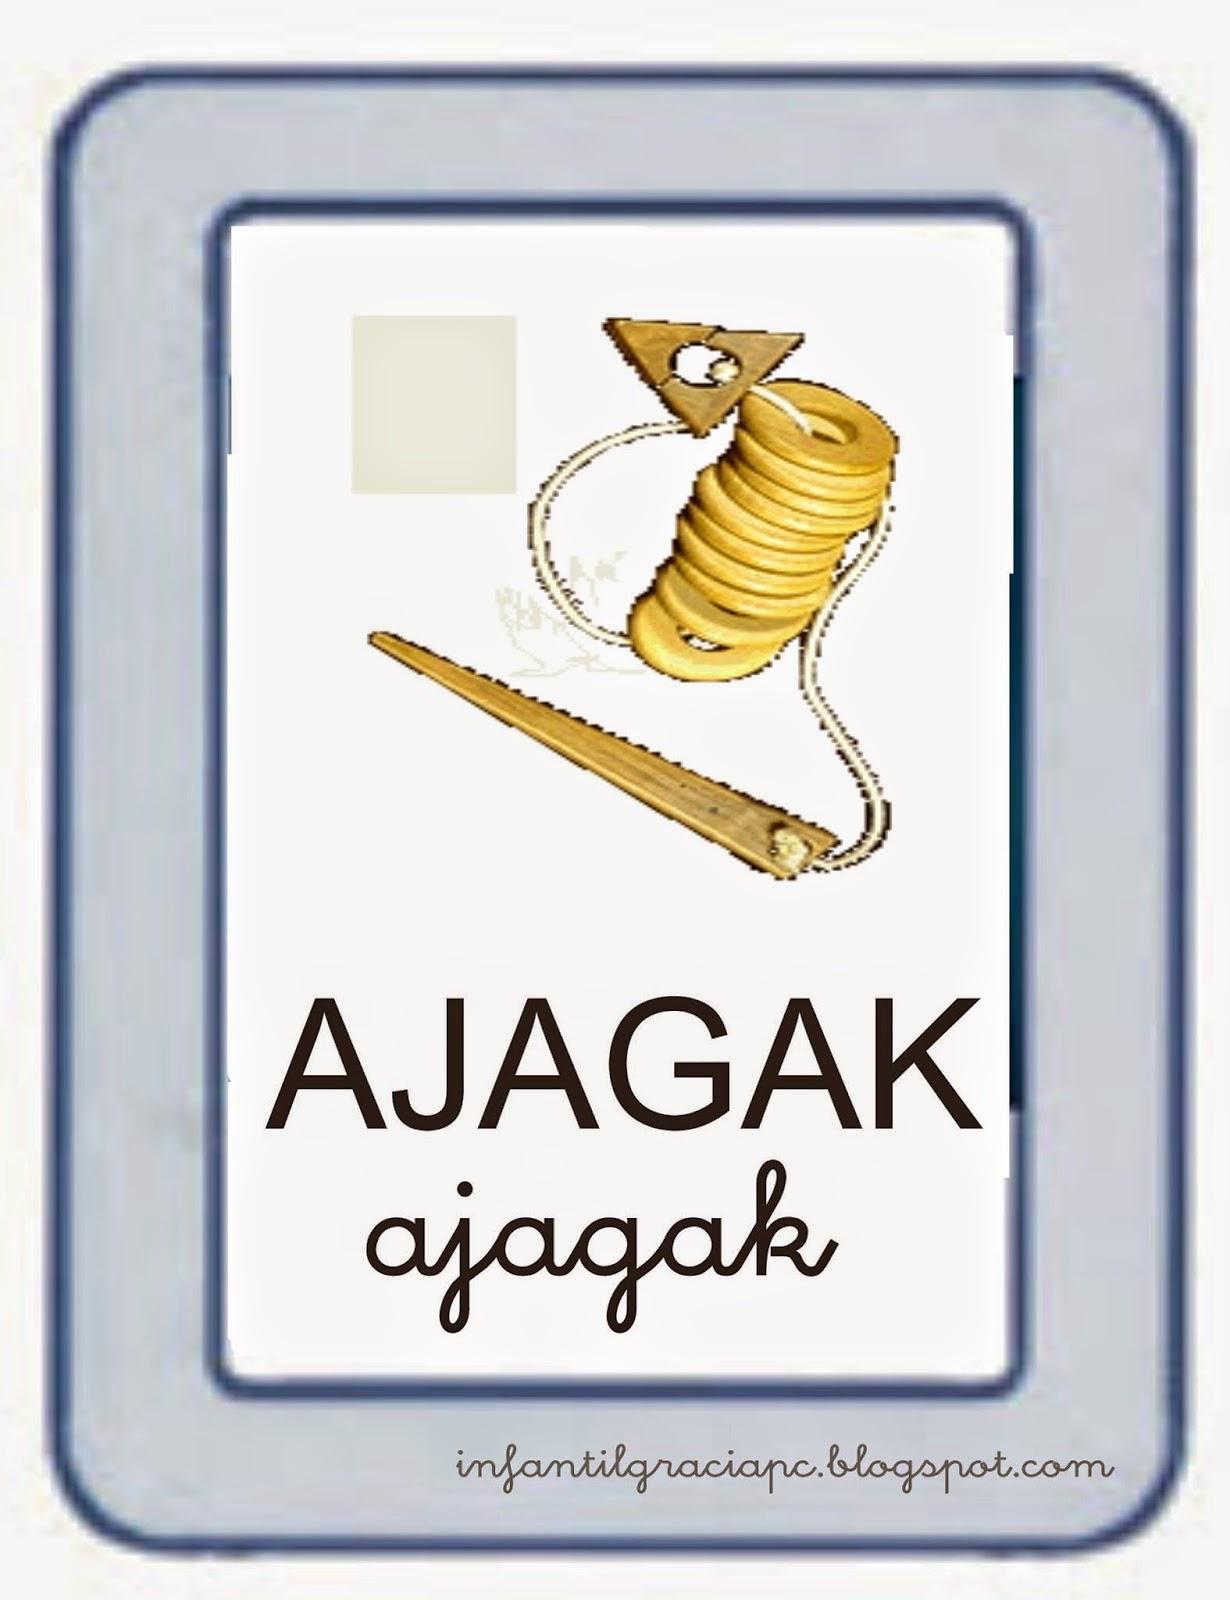 Resultado de imagen de AJAGAK